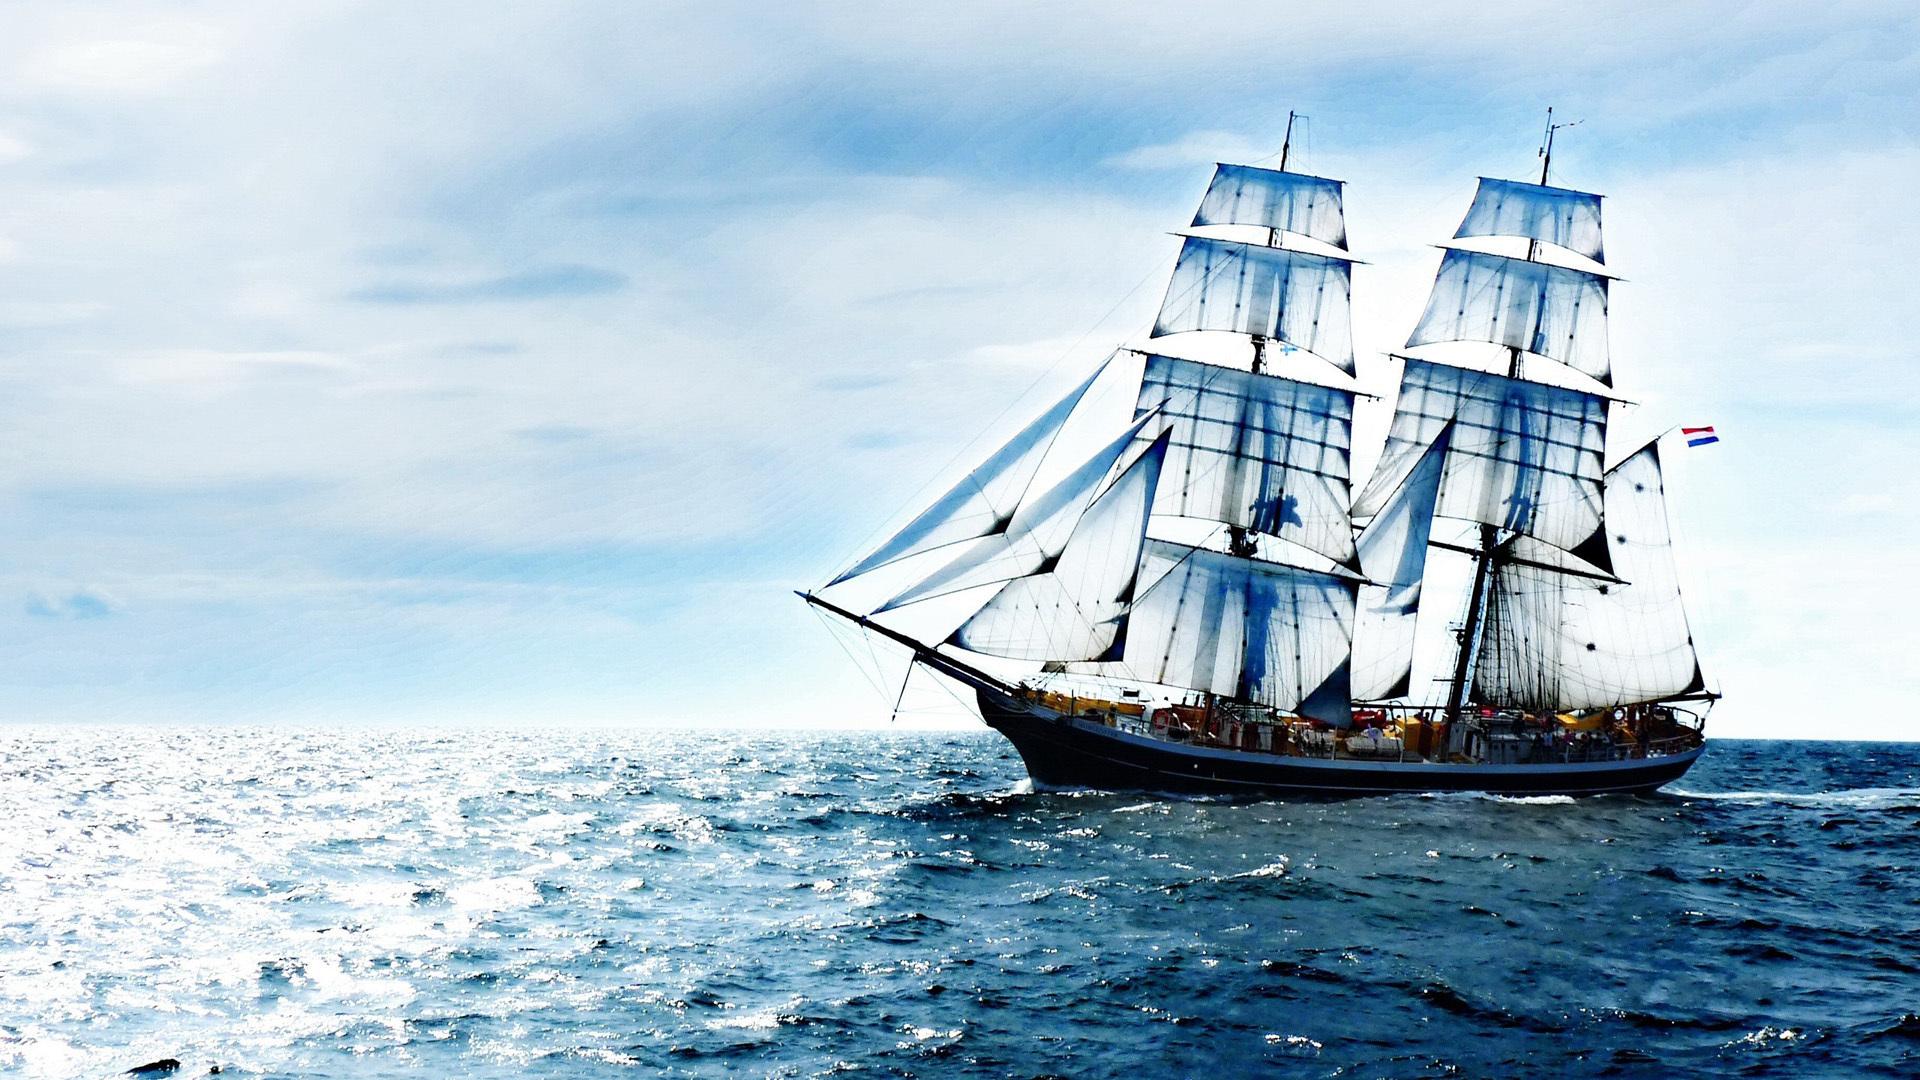 sailboat wallpaper 7771